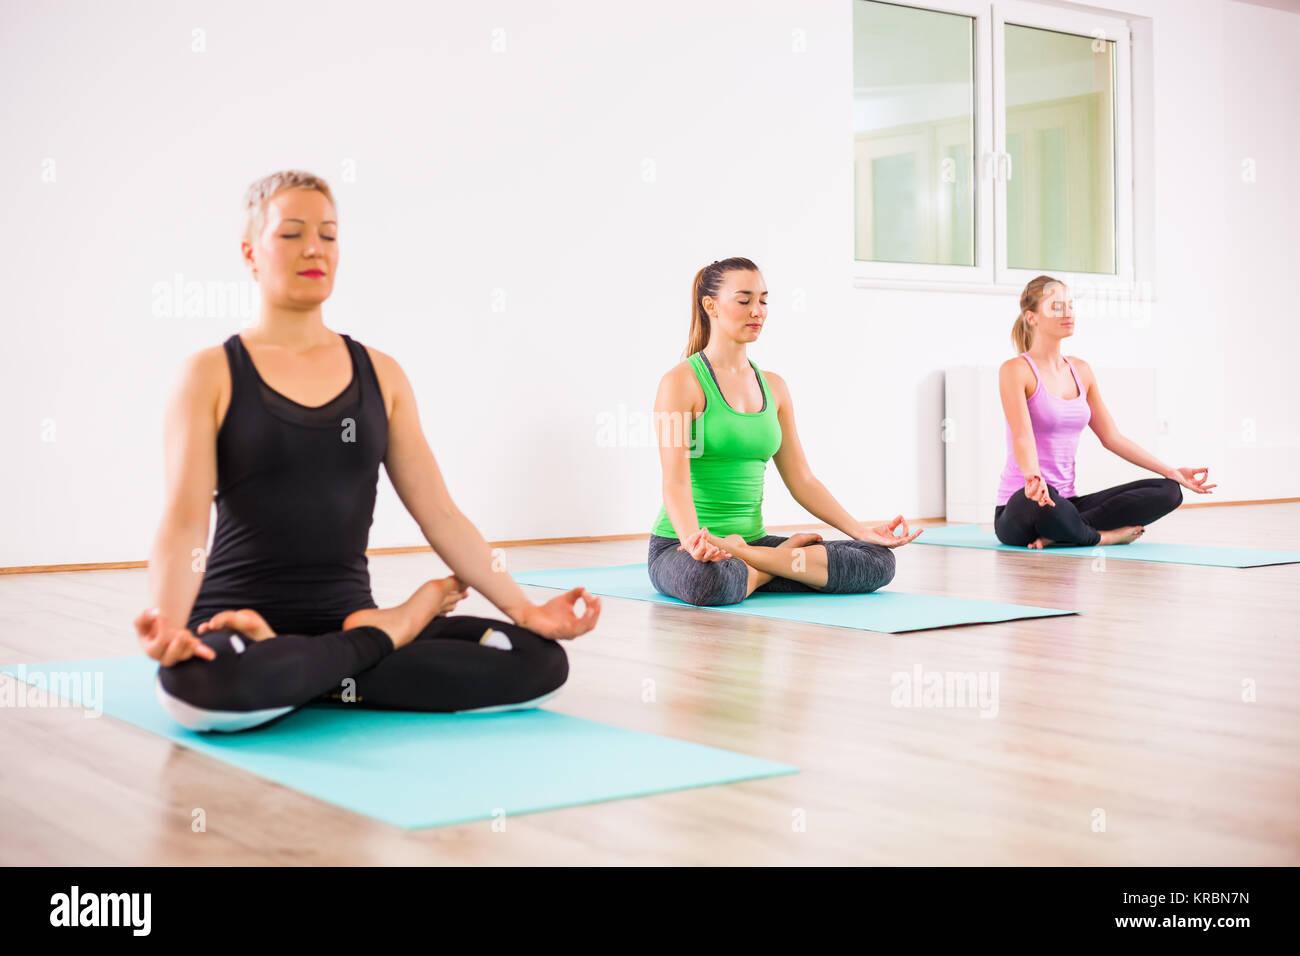 Three girls practicing yoga, Padmasana / Lotus Position - Stock Image